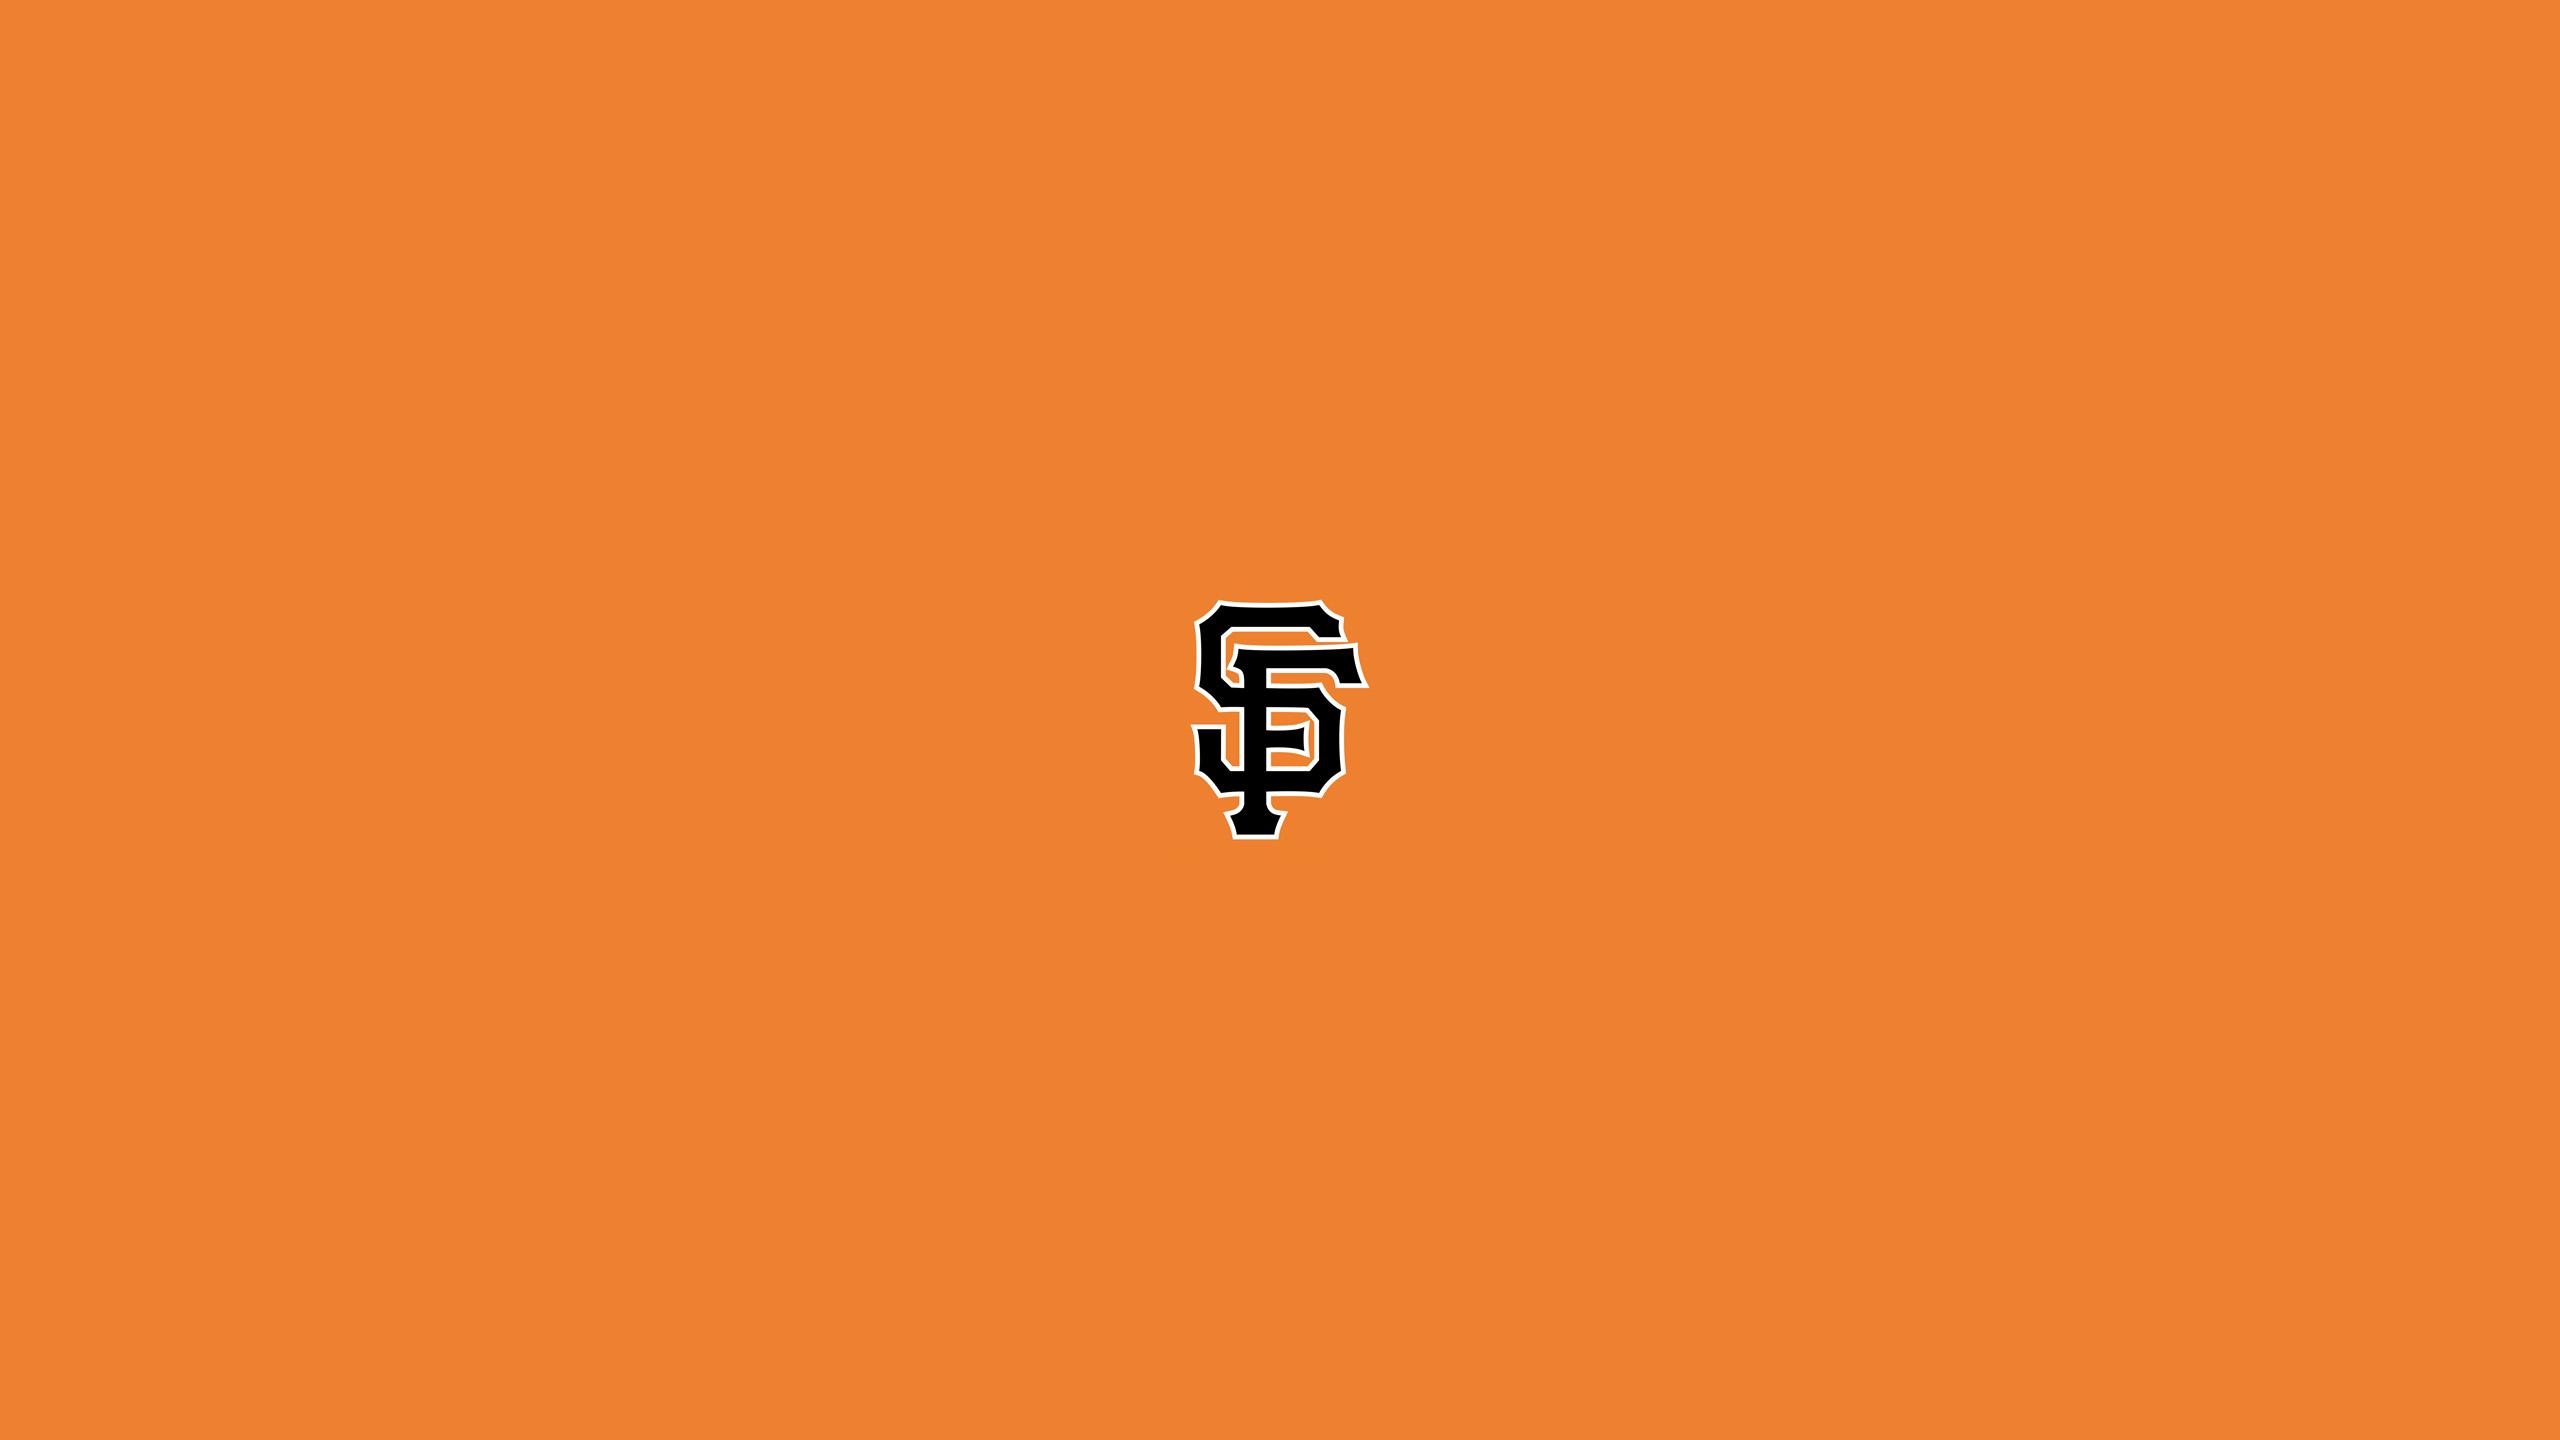 Baseball Mlb San Francisco Giants Tim Lincecum X Wallpaper Www